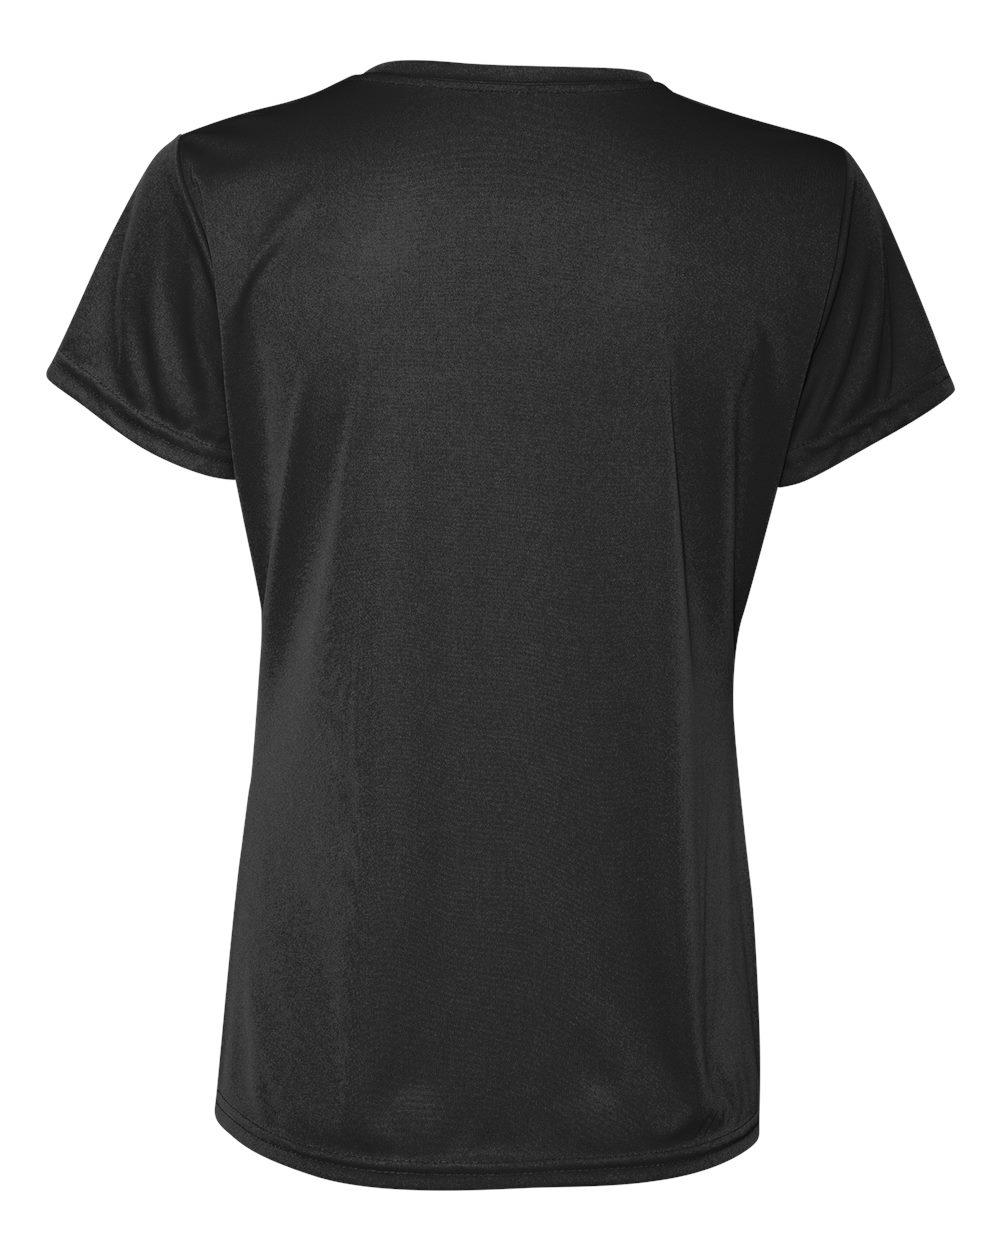 Augusta-Sportswear-Women-039-s-Moisture-Wicking-V-Neck-T-Shirt-1790-XS-2XL thumbnail 10